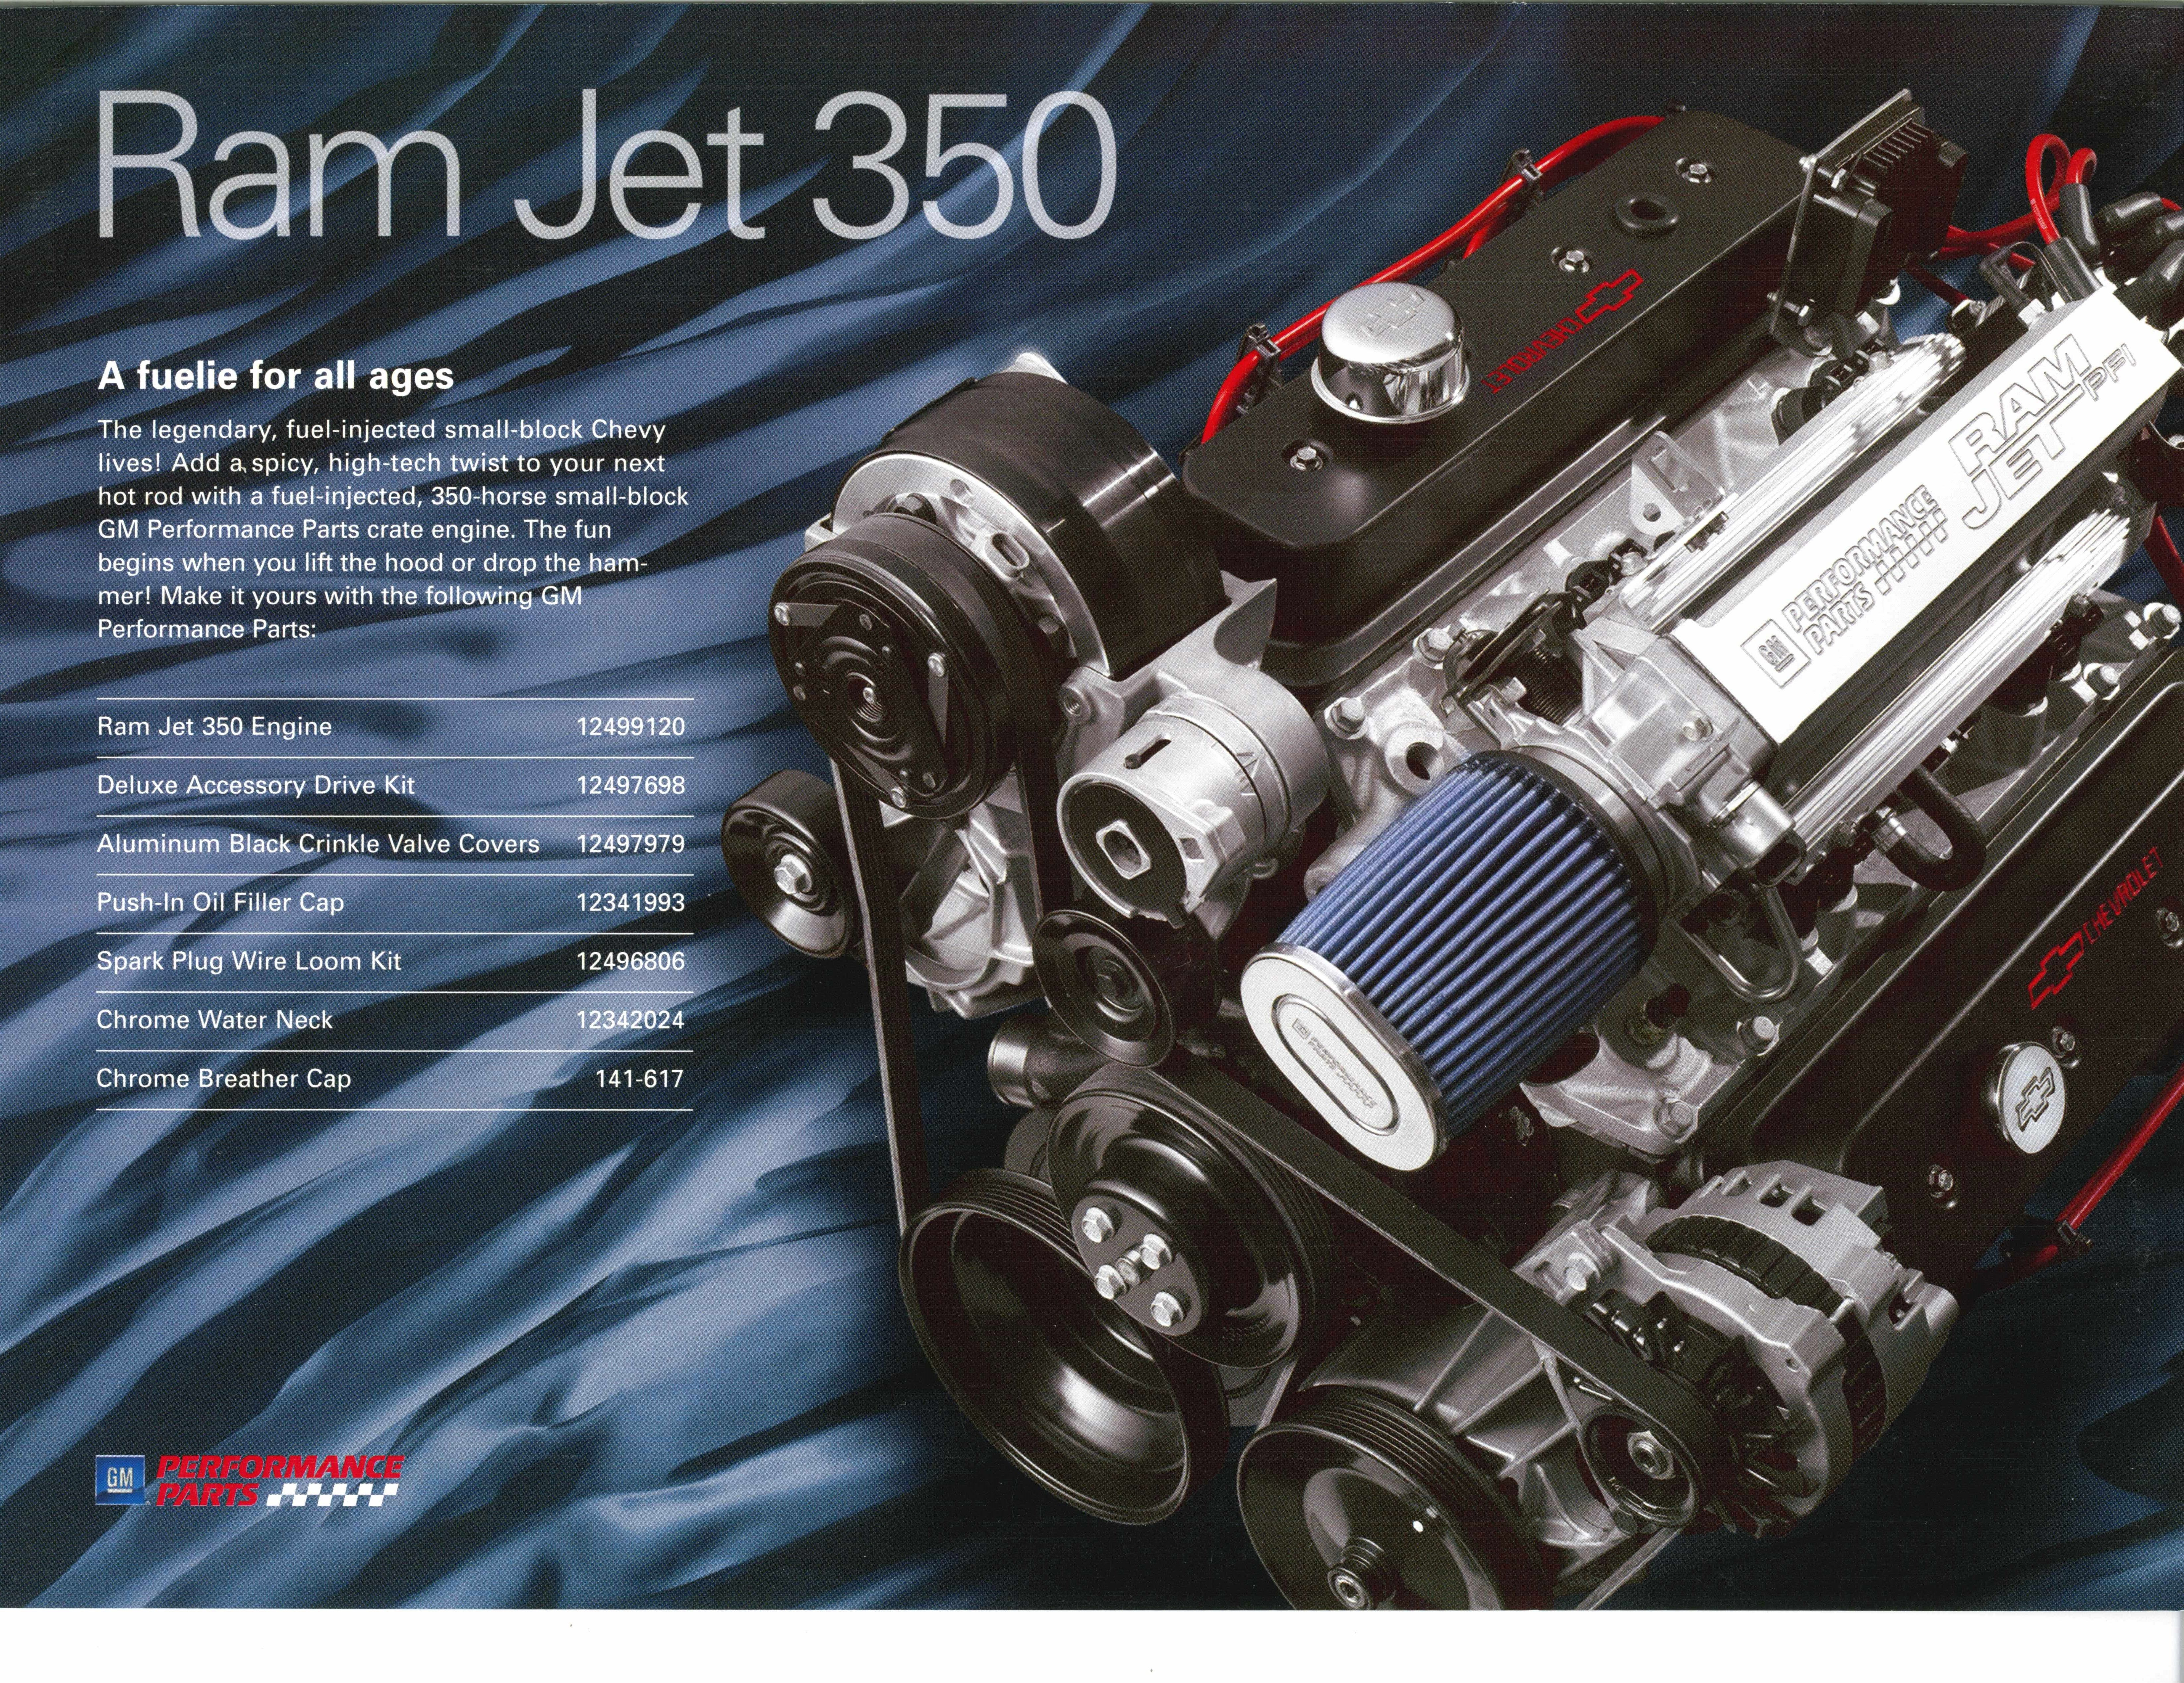 Gm Performance Ram Jet 350 Crate Engines 57 Chevy Trucks Jet Motor